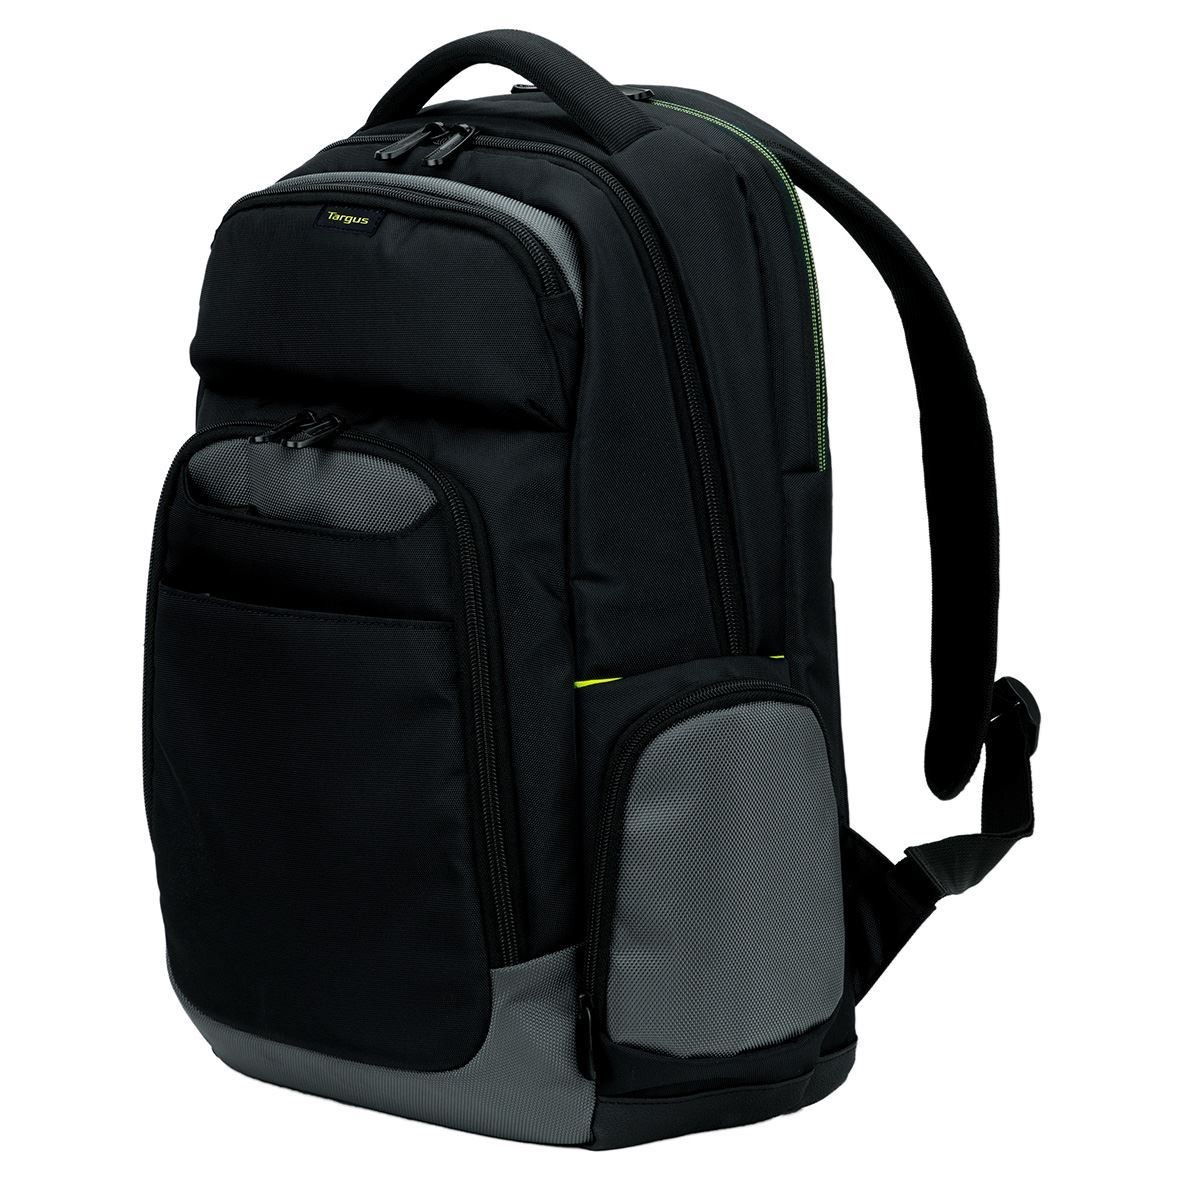 "CityGear 15.6"" Laptop Backpack Black"